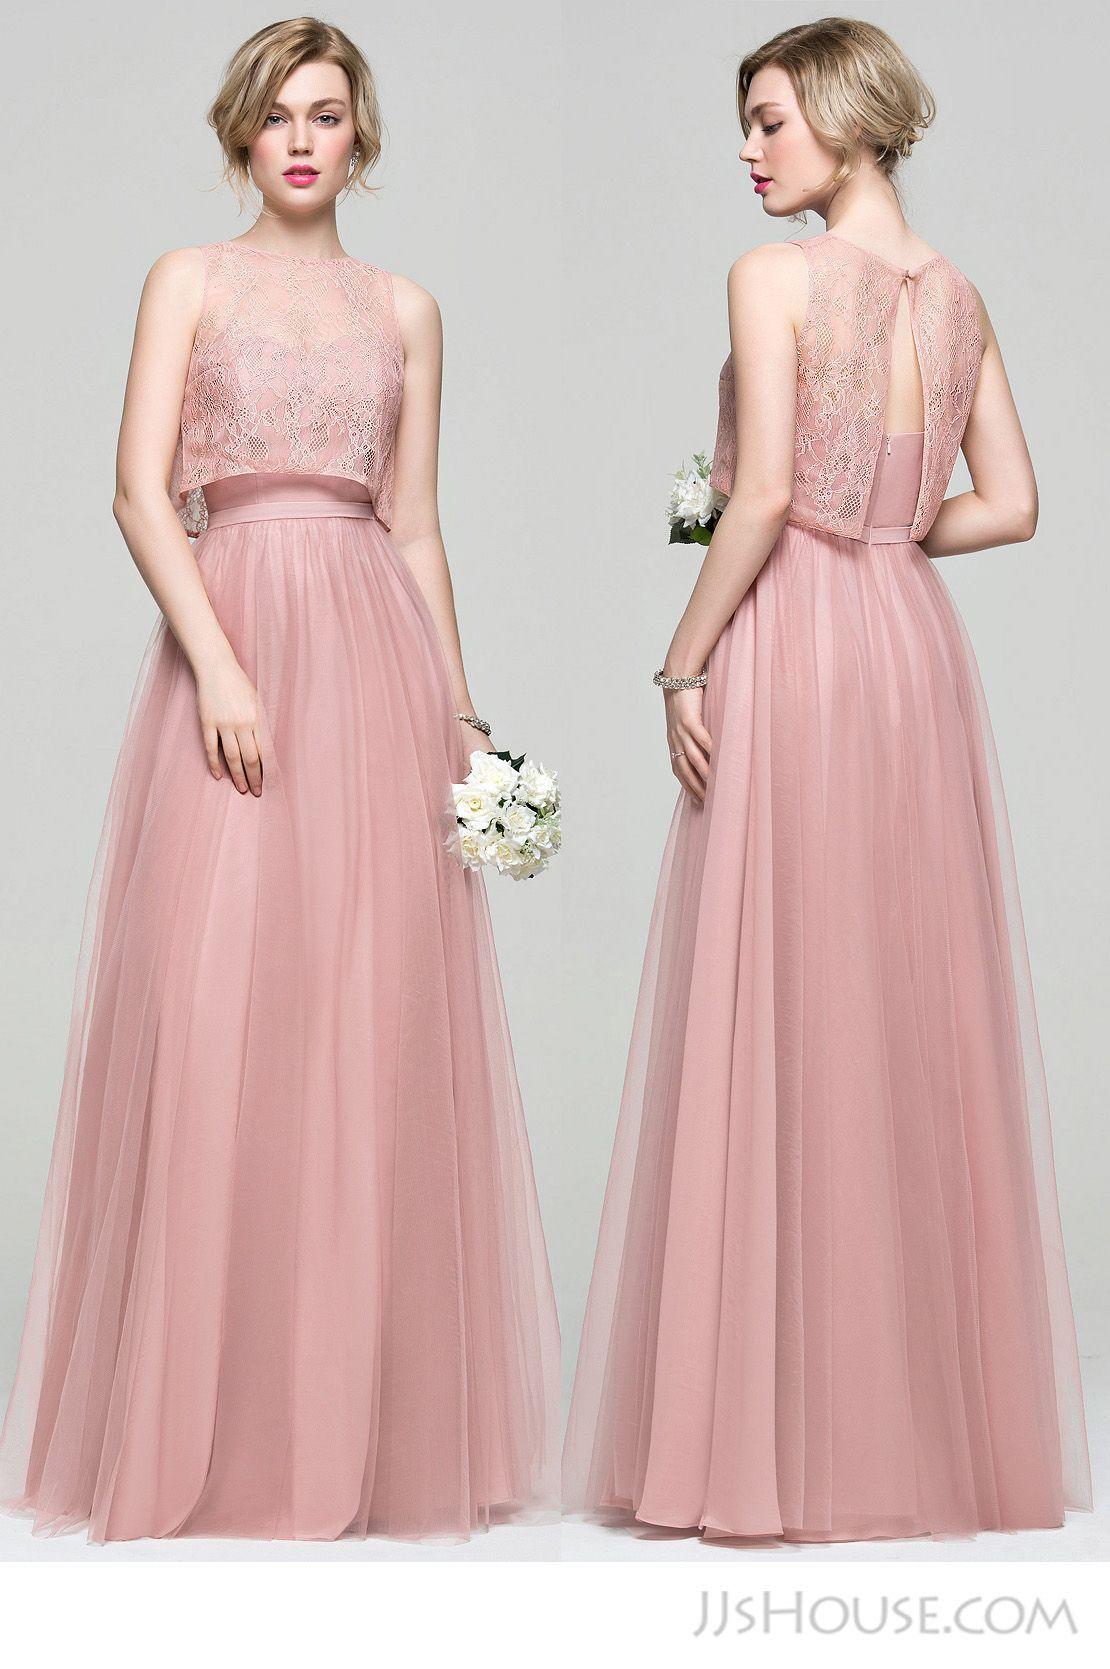 337c97c4969a Elegant bridesmaid dress. #JJsHouse #JJsHouseBridesmaidDress  #bridesmaiddresses